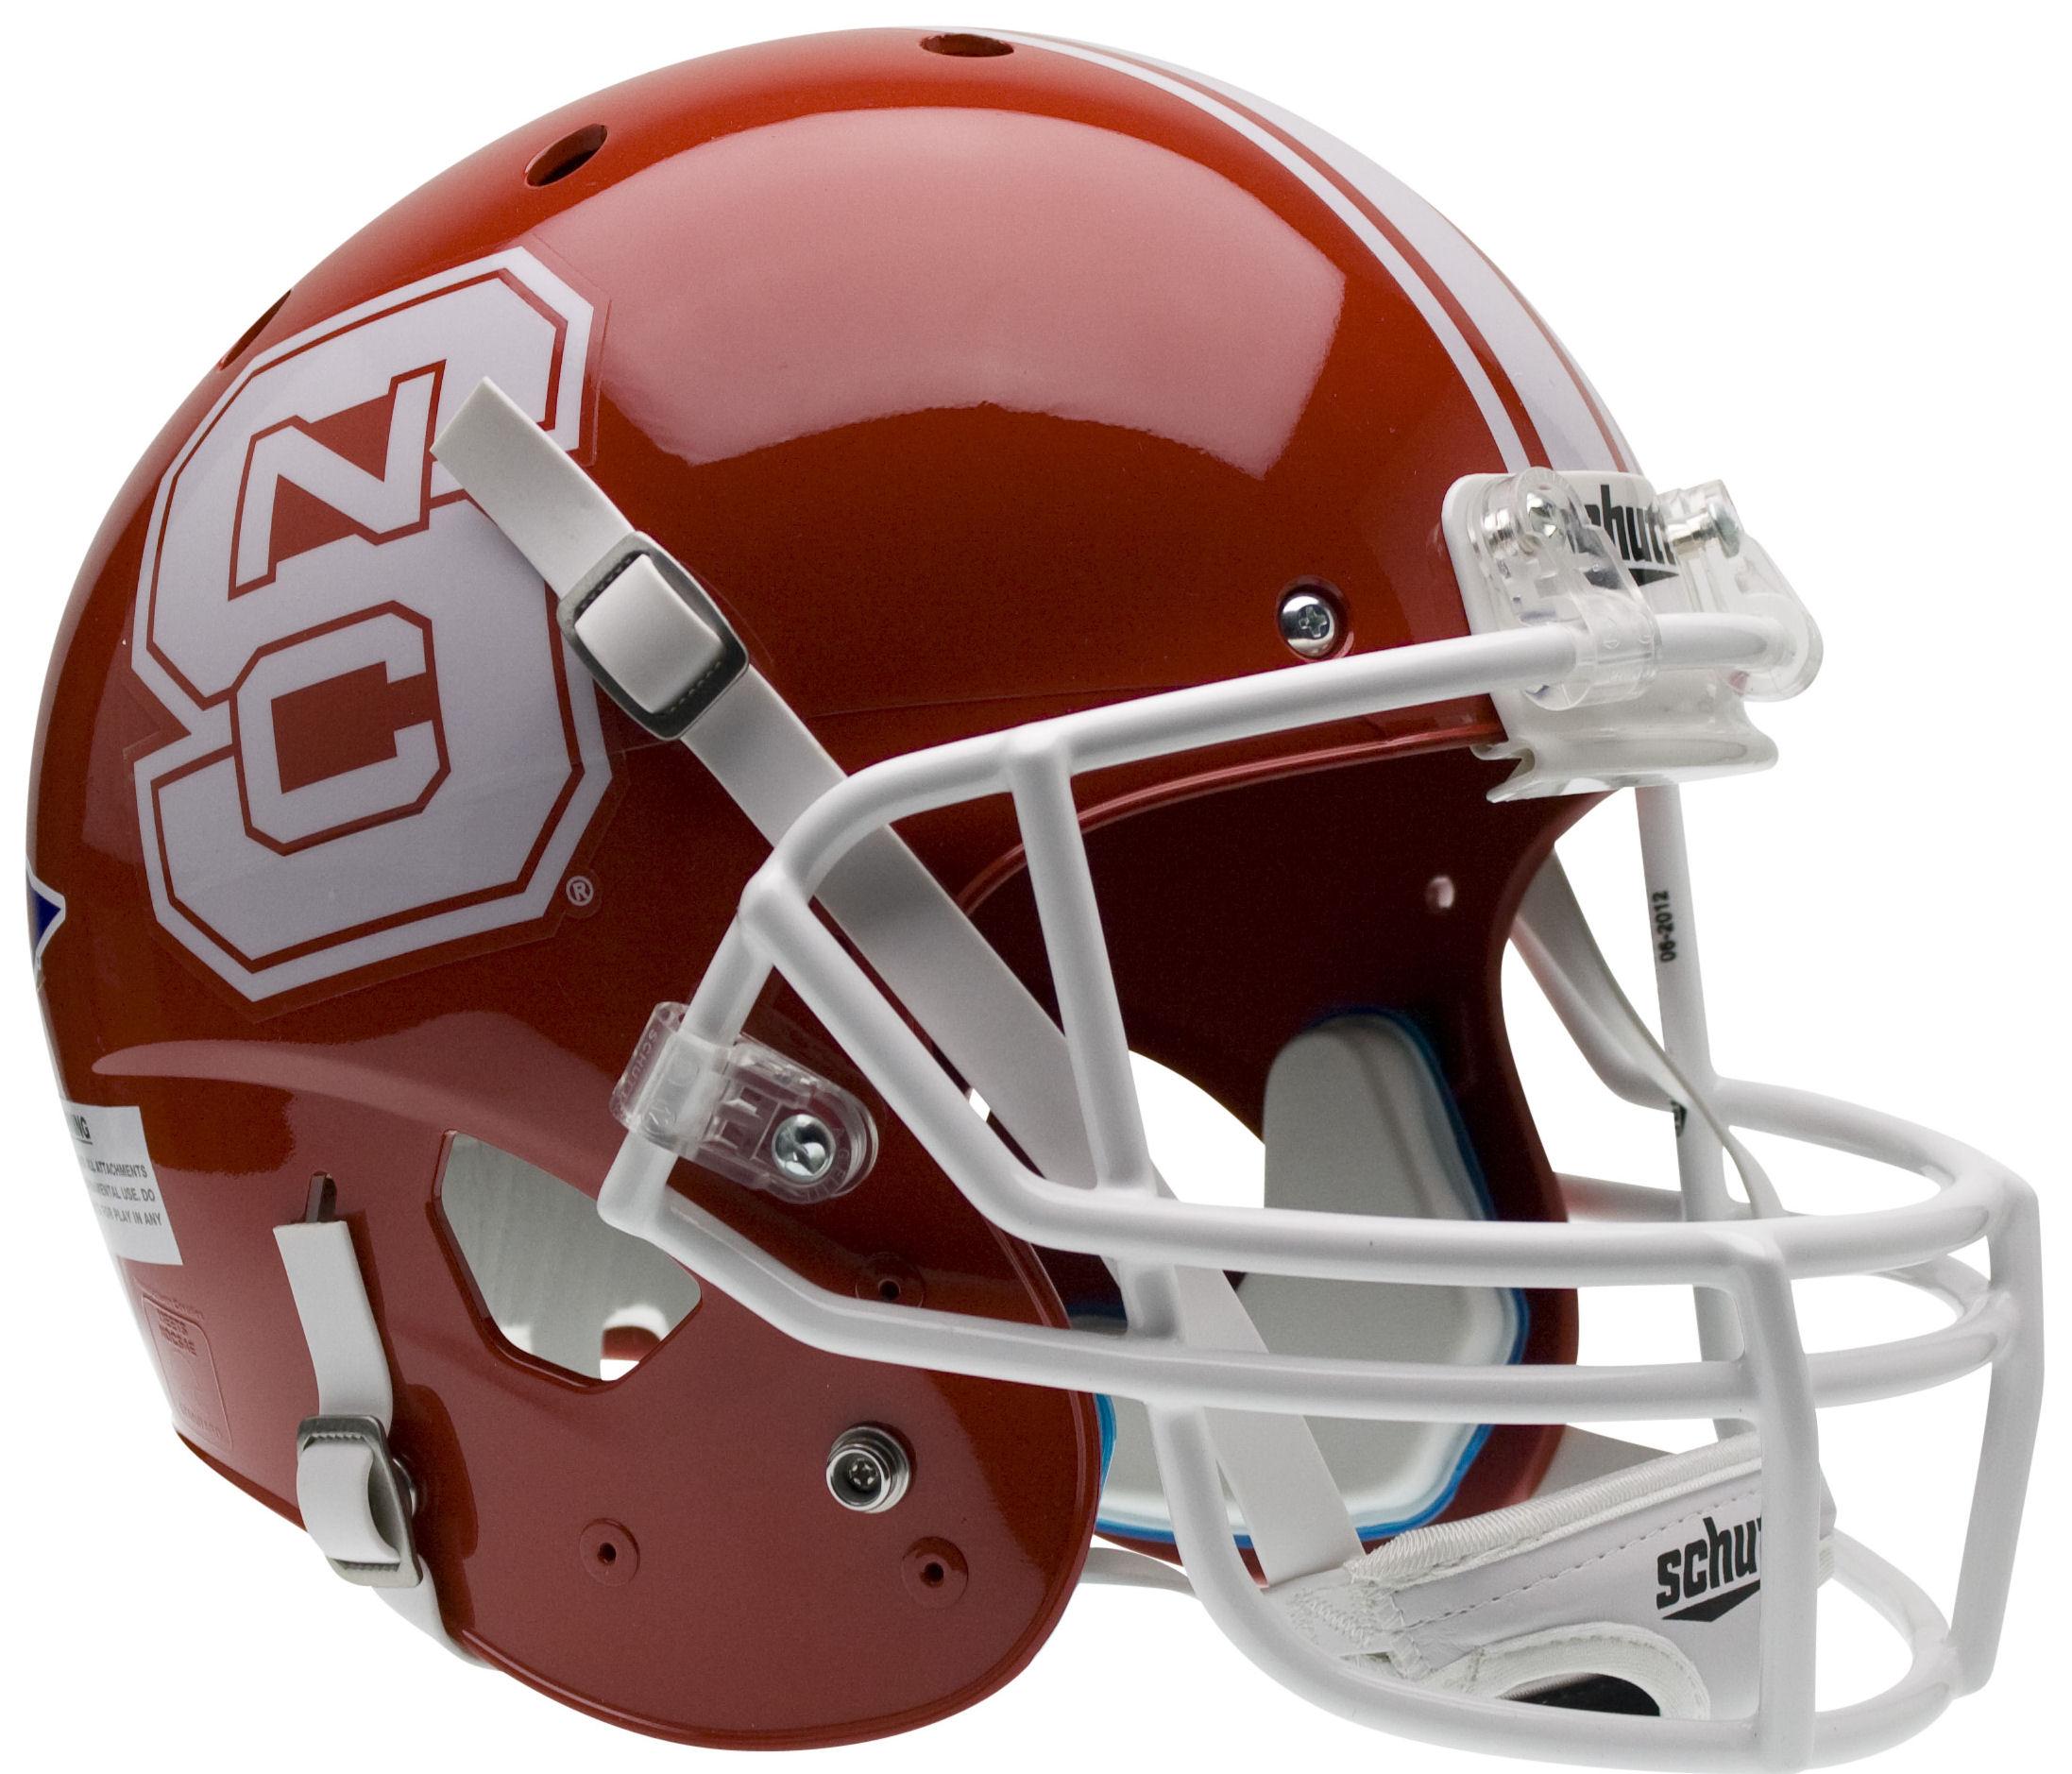 North Carolina State Wolfpack Full XP Replica Football Helmet Schutt <B>Red</B>